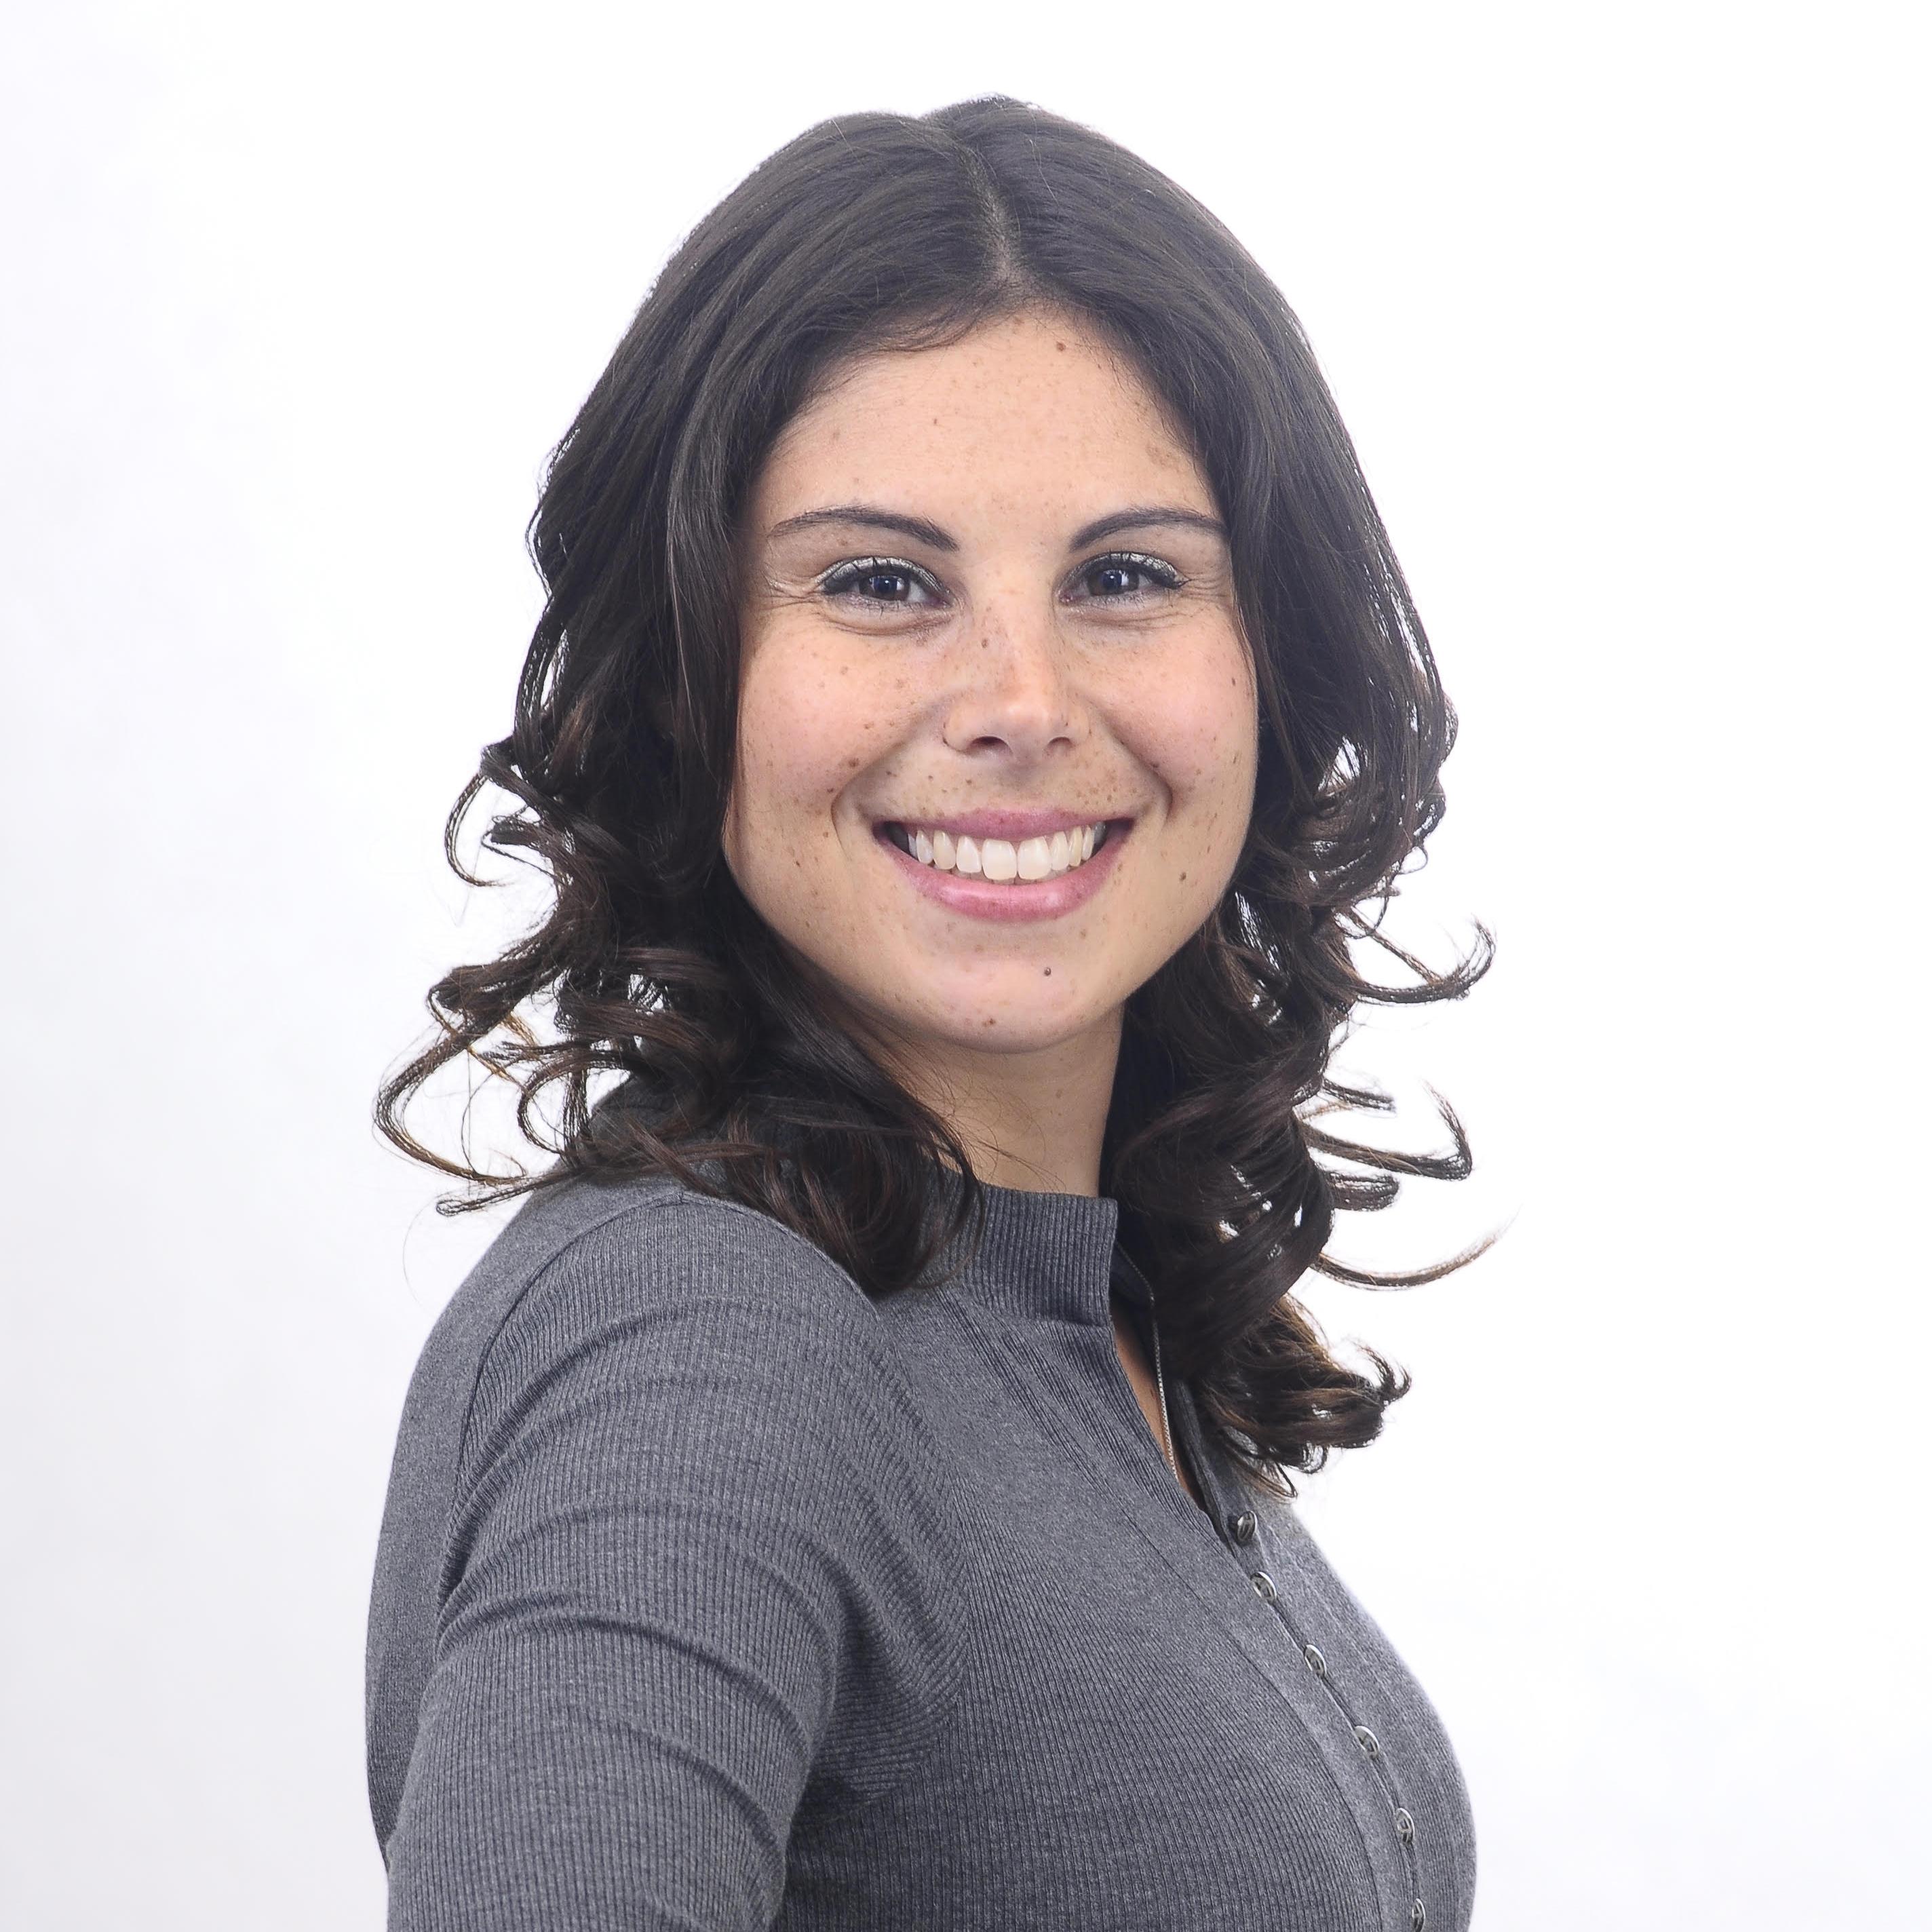 Elisa Pepe